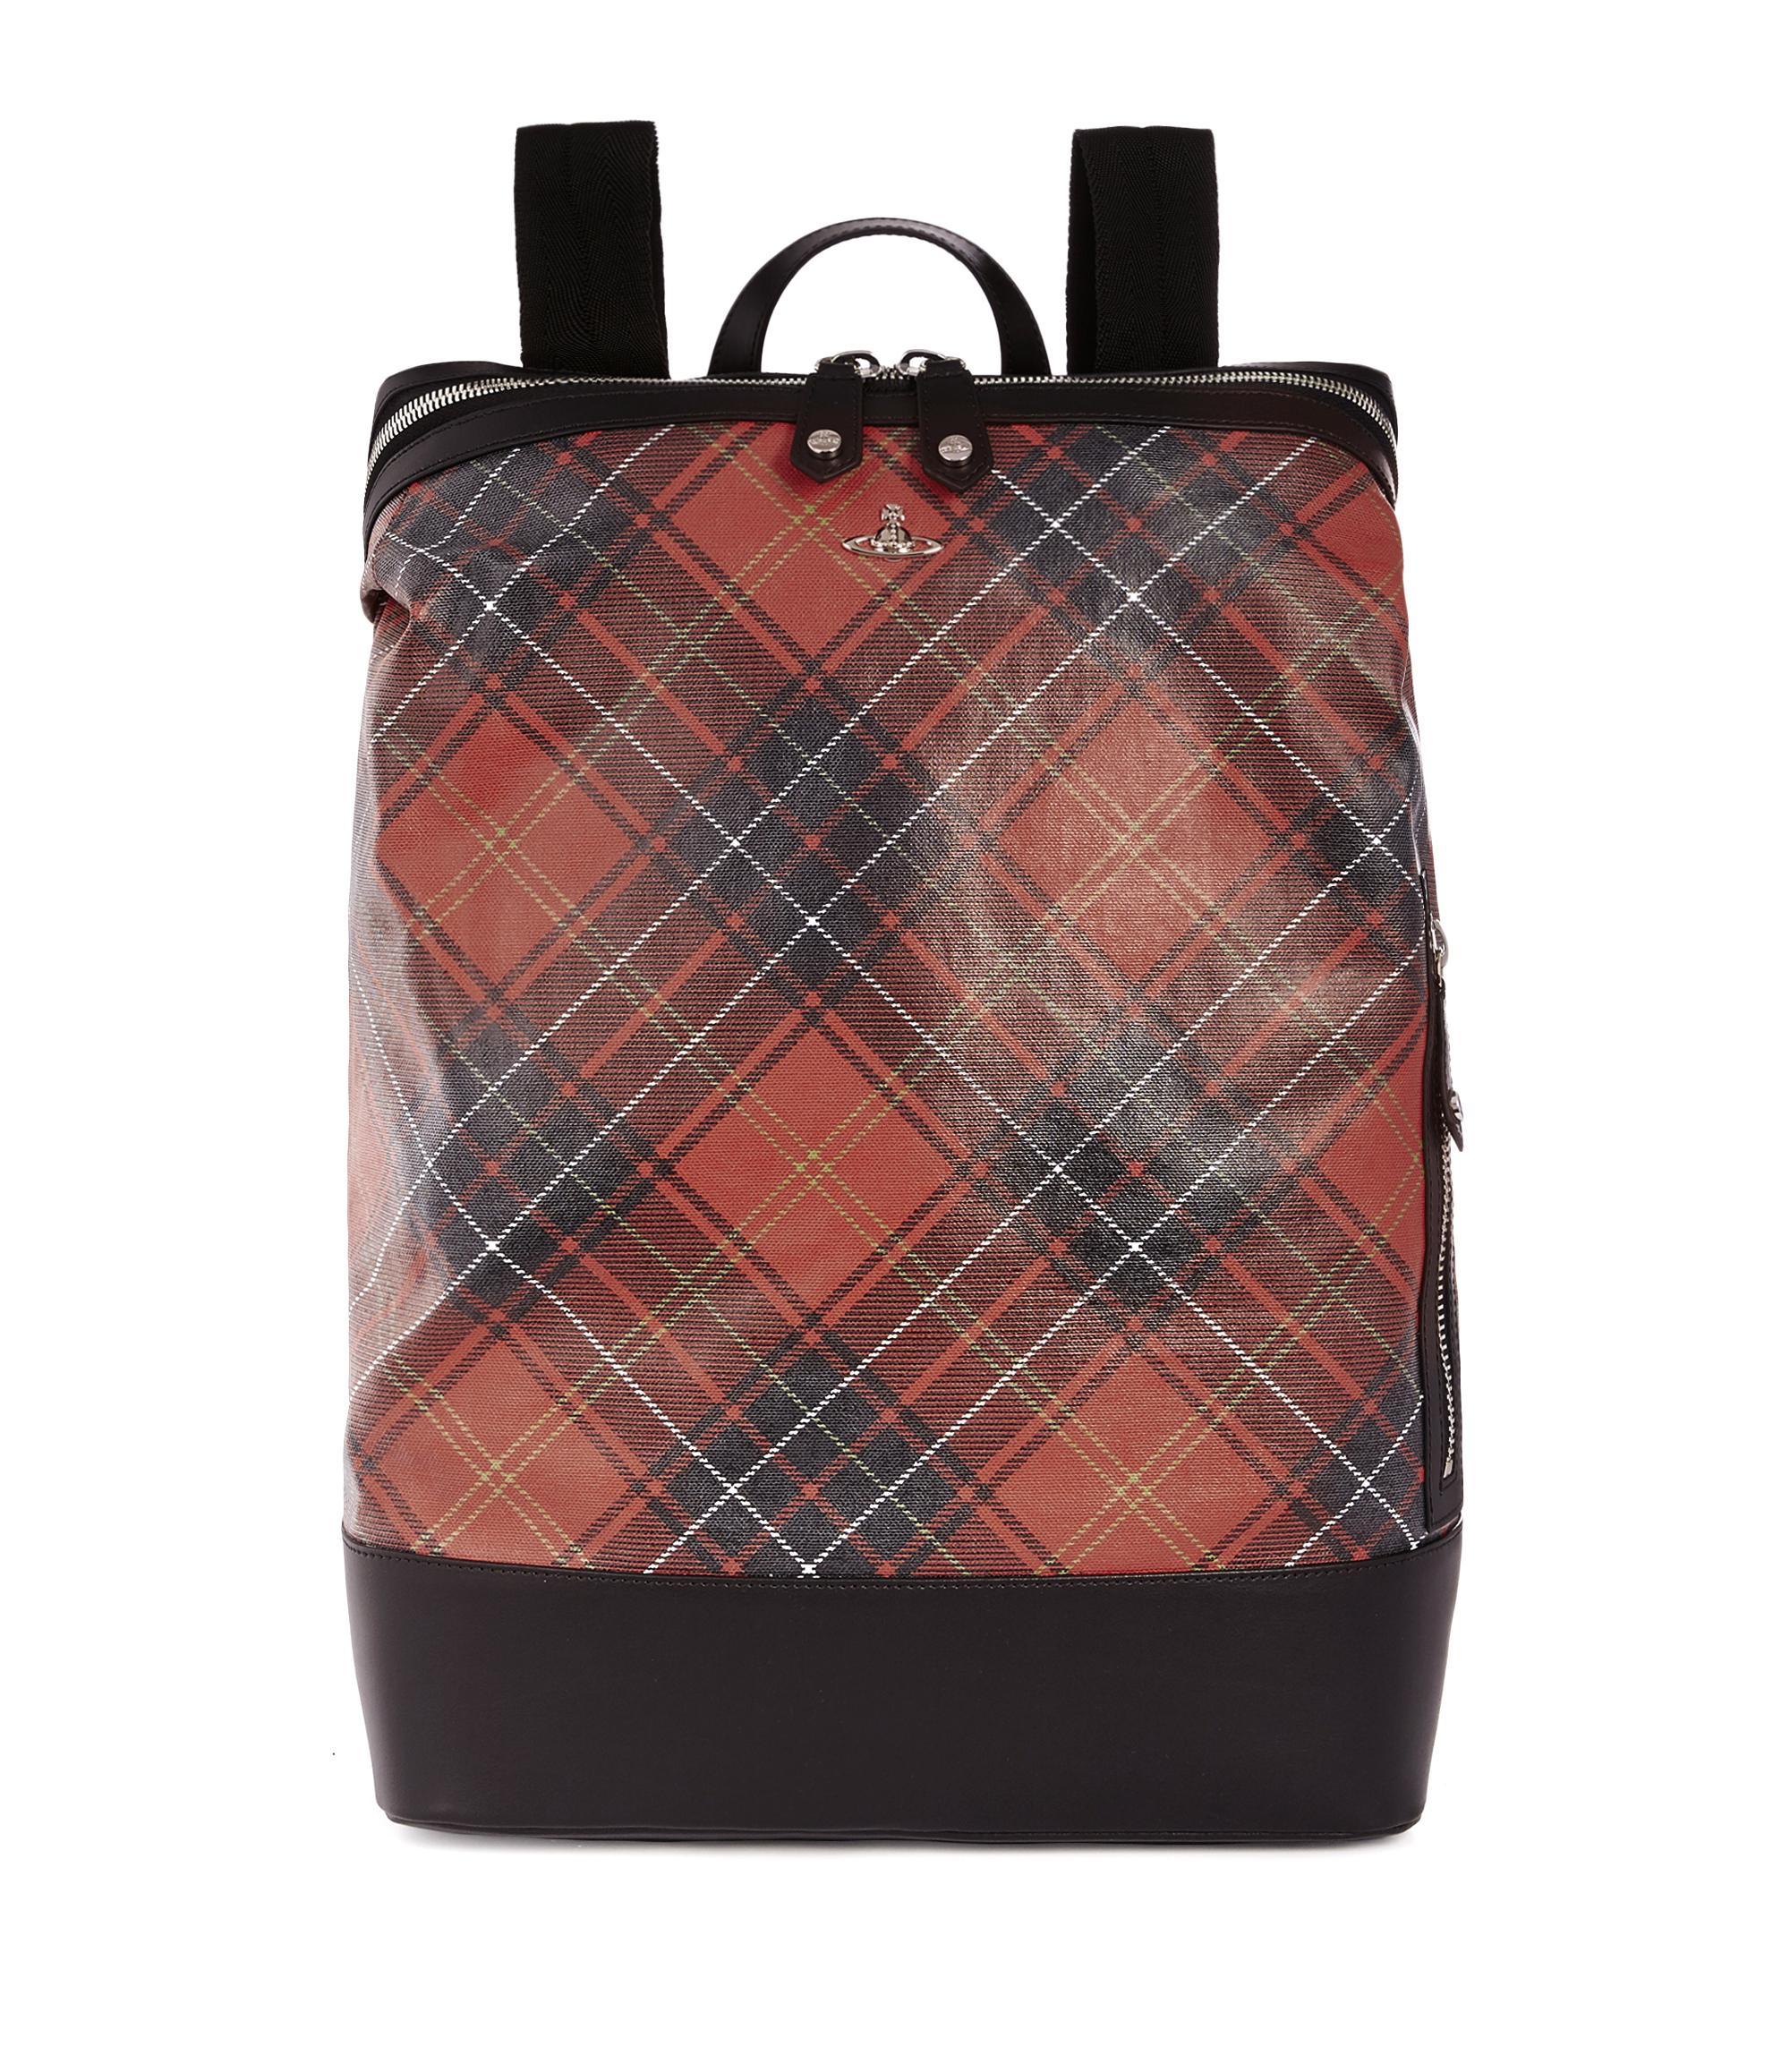 Vivienne Westwood Wimbledon Backpack 131265 Black